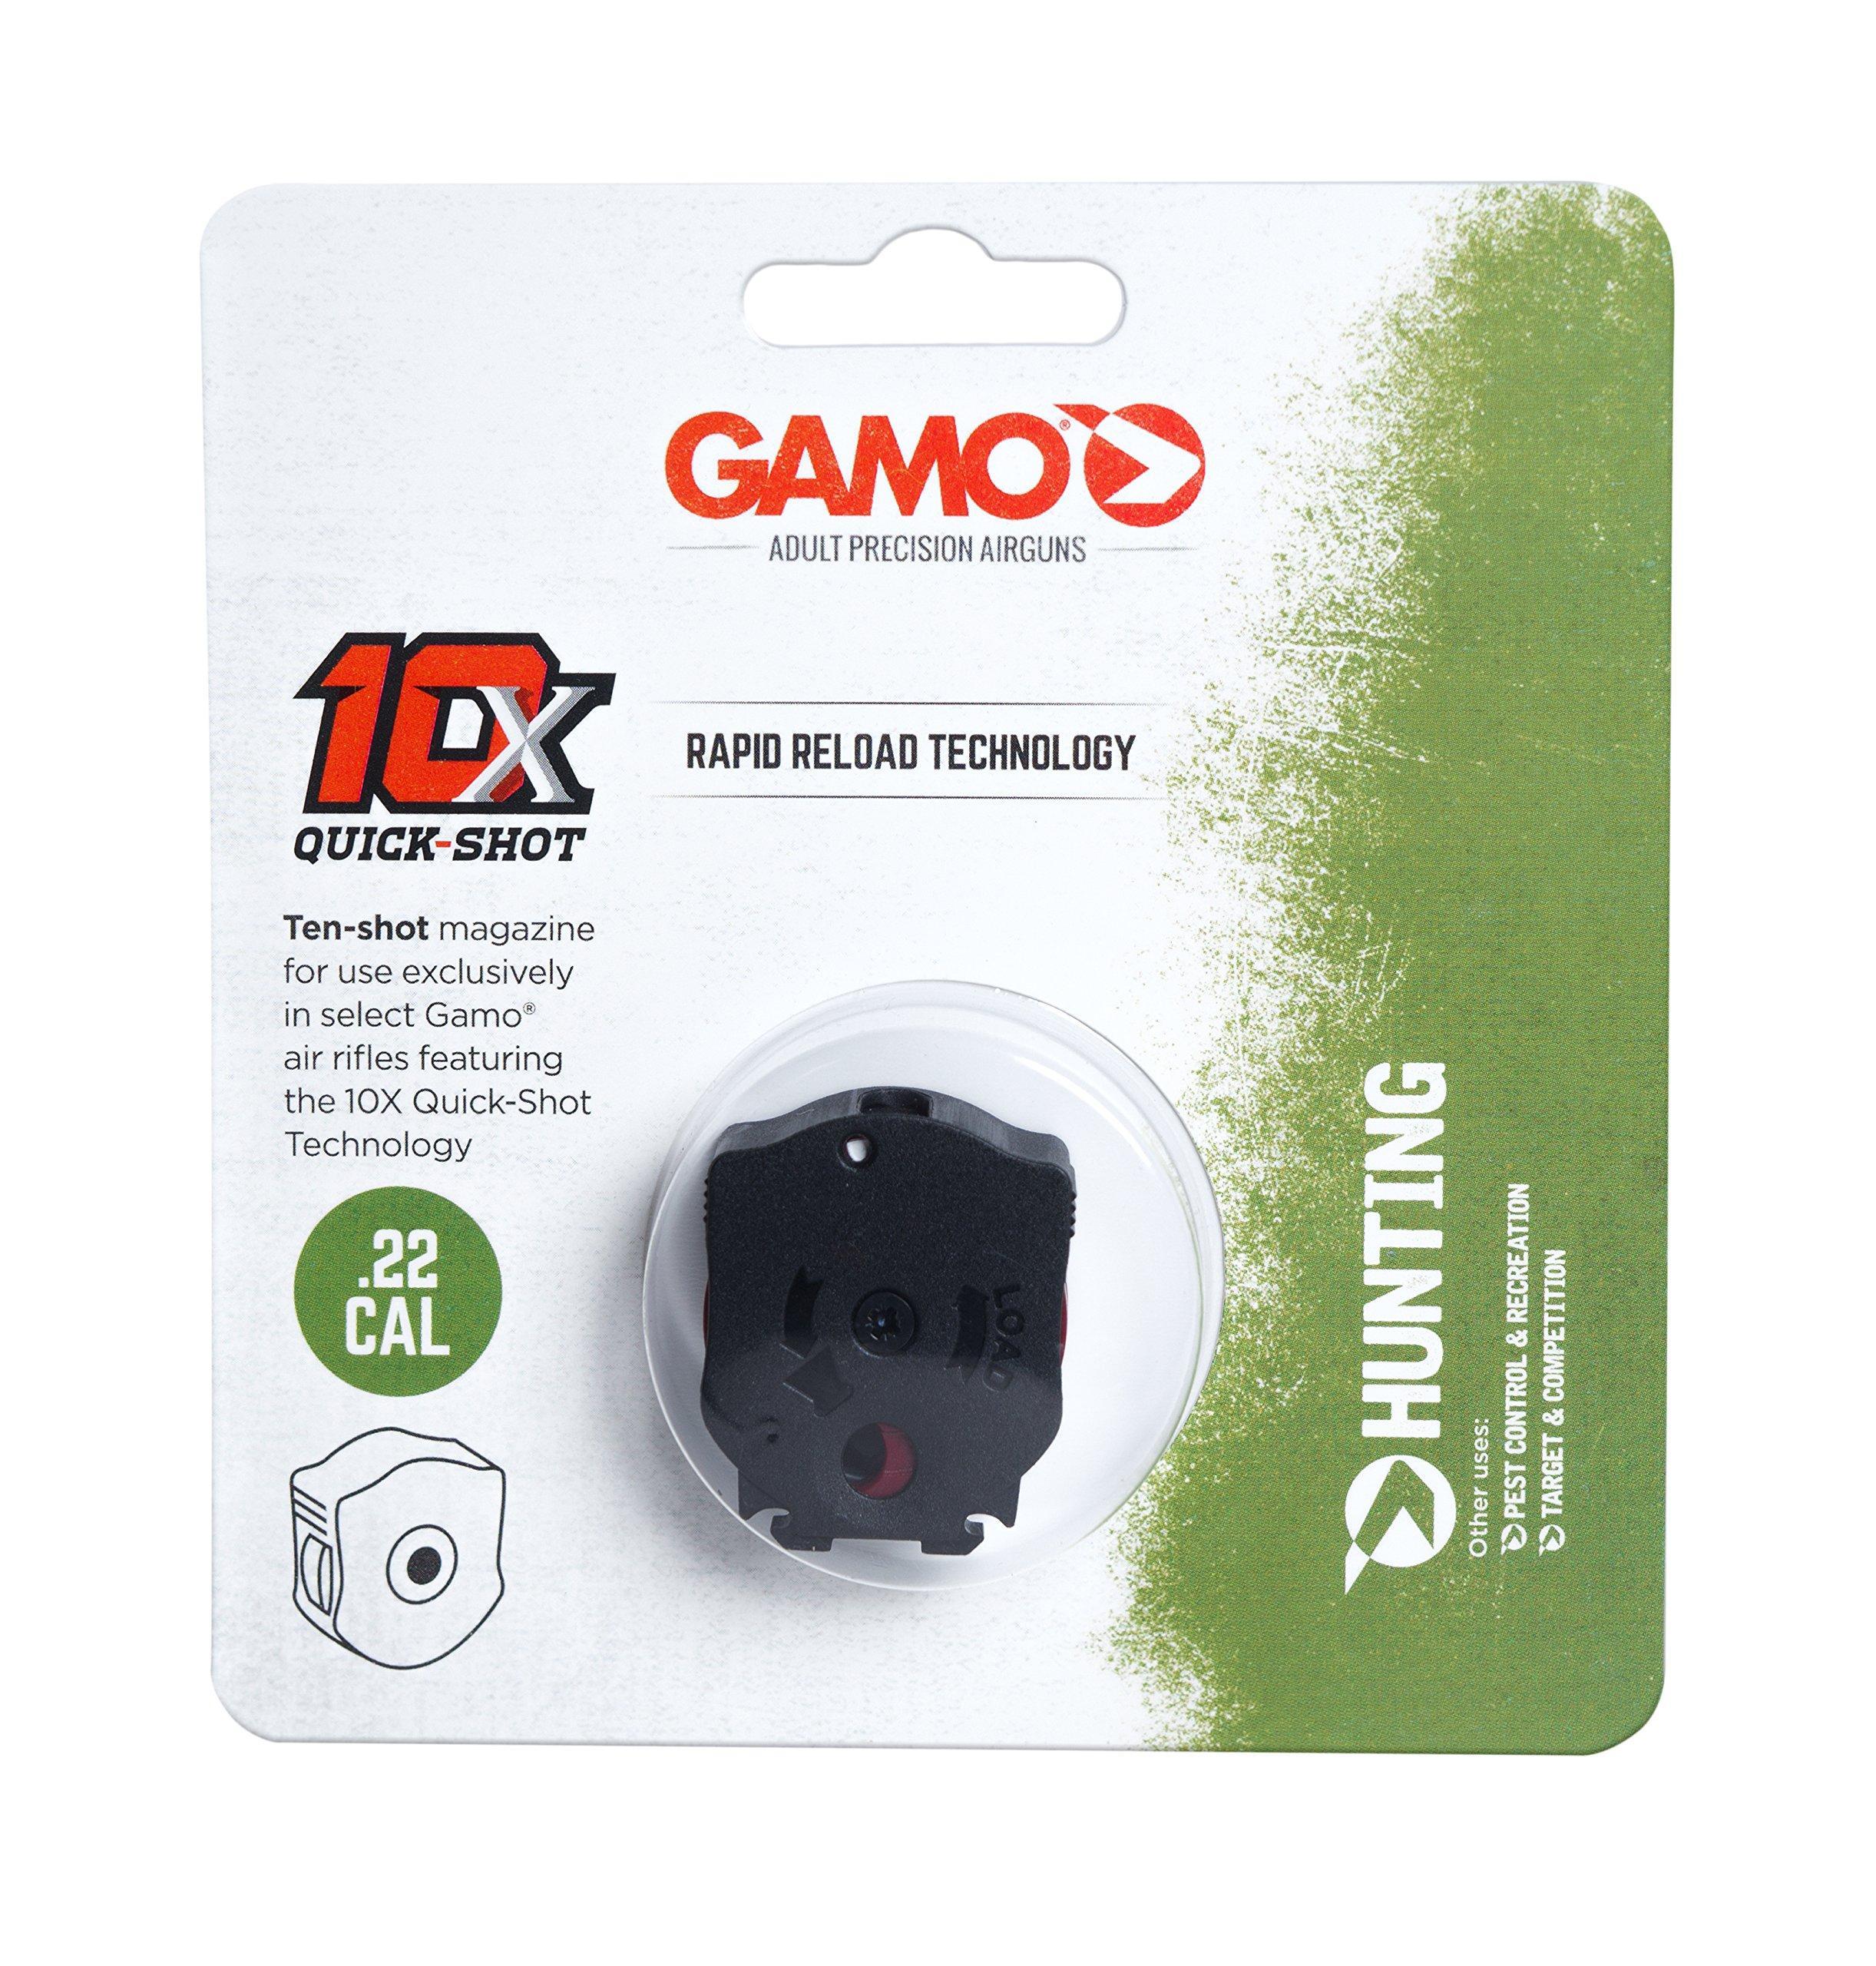 Gamo-Outdoors-22-Cal-10X-QUICK-SHOT-Magazine-for-Gamo-Swarm-Maxxim-10-shot thumbnail 3